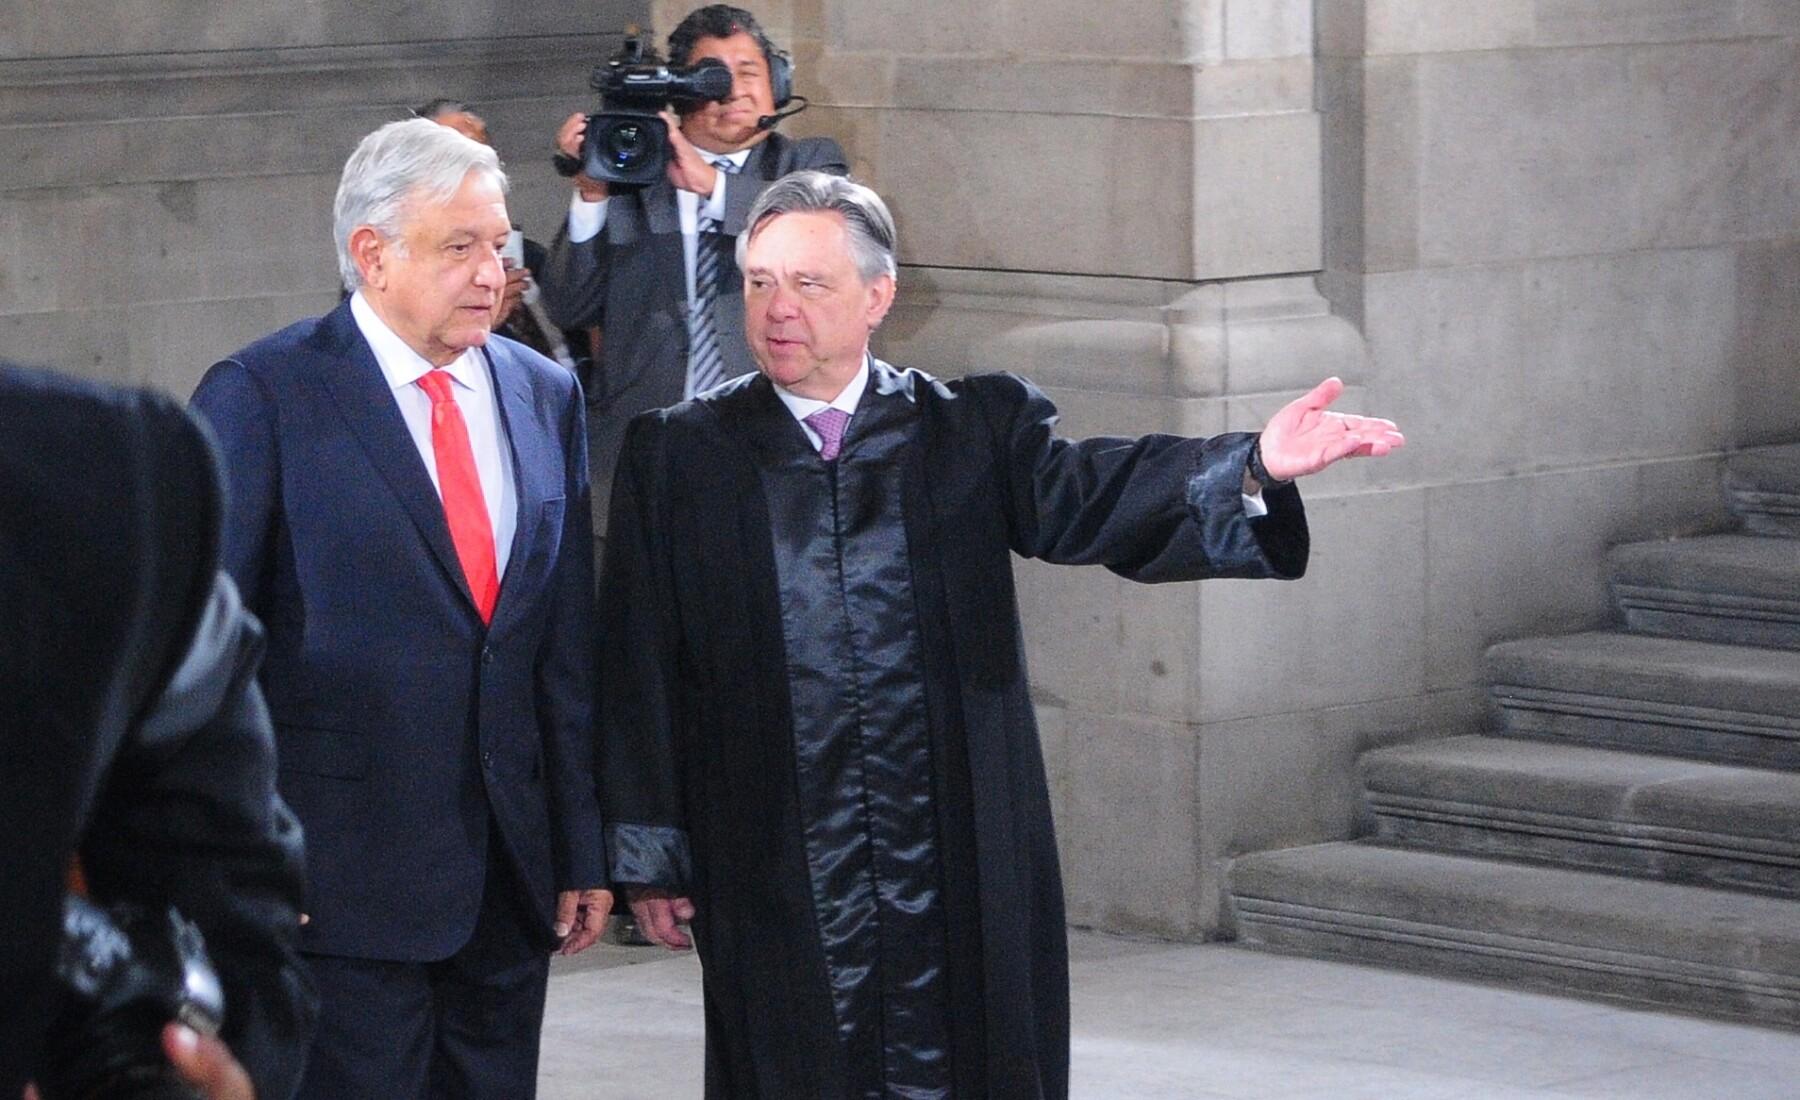 Eduardo Medina Mora dejó la SCJN, su cargo como ministro debía terminar en 2030.